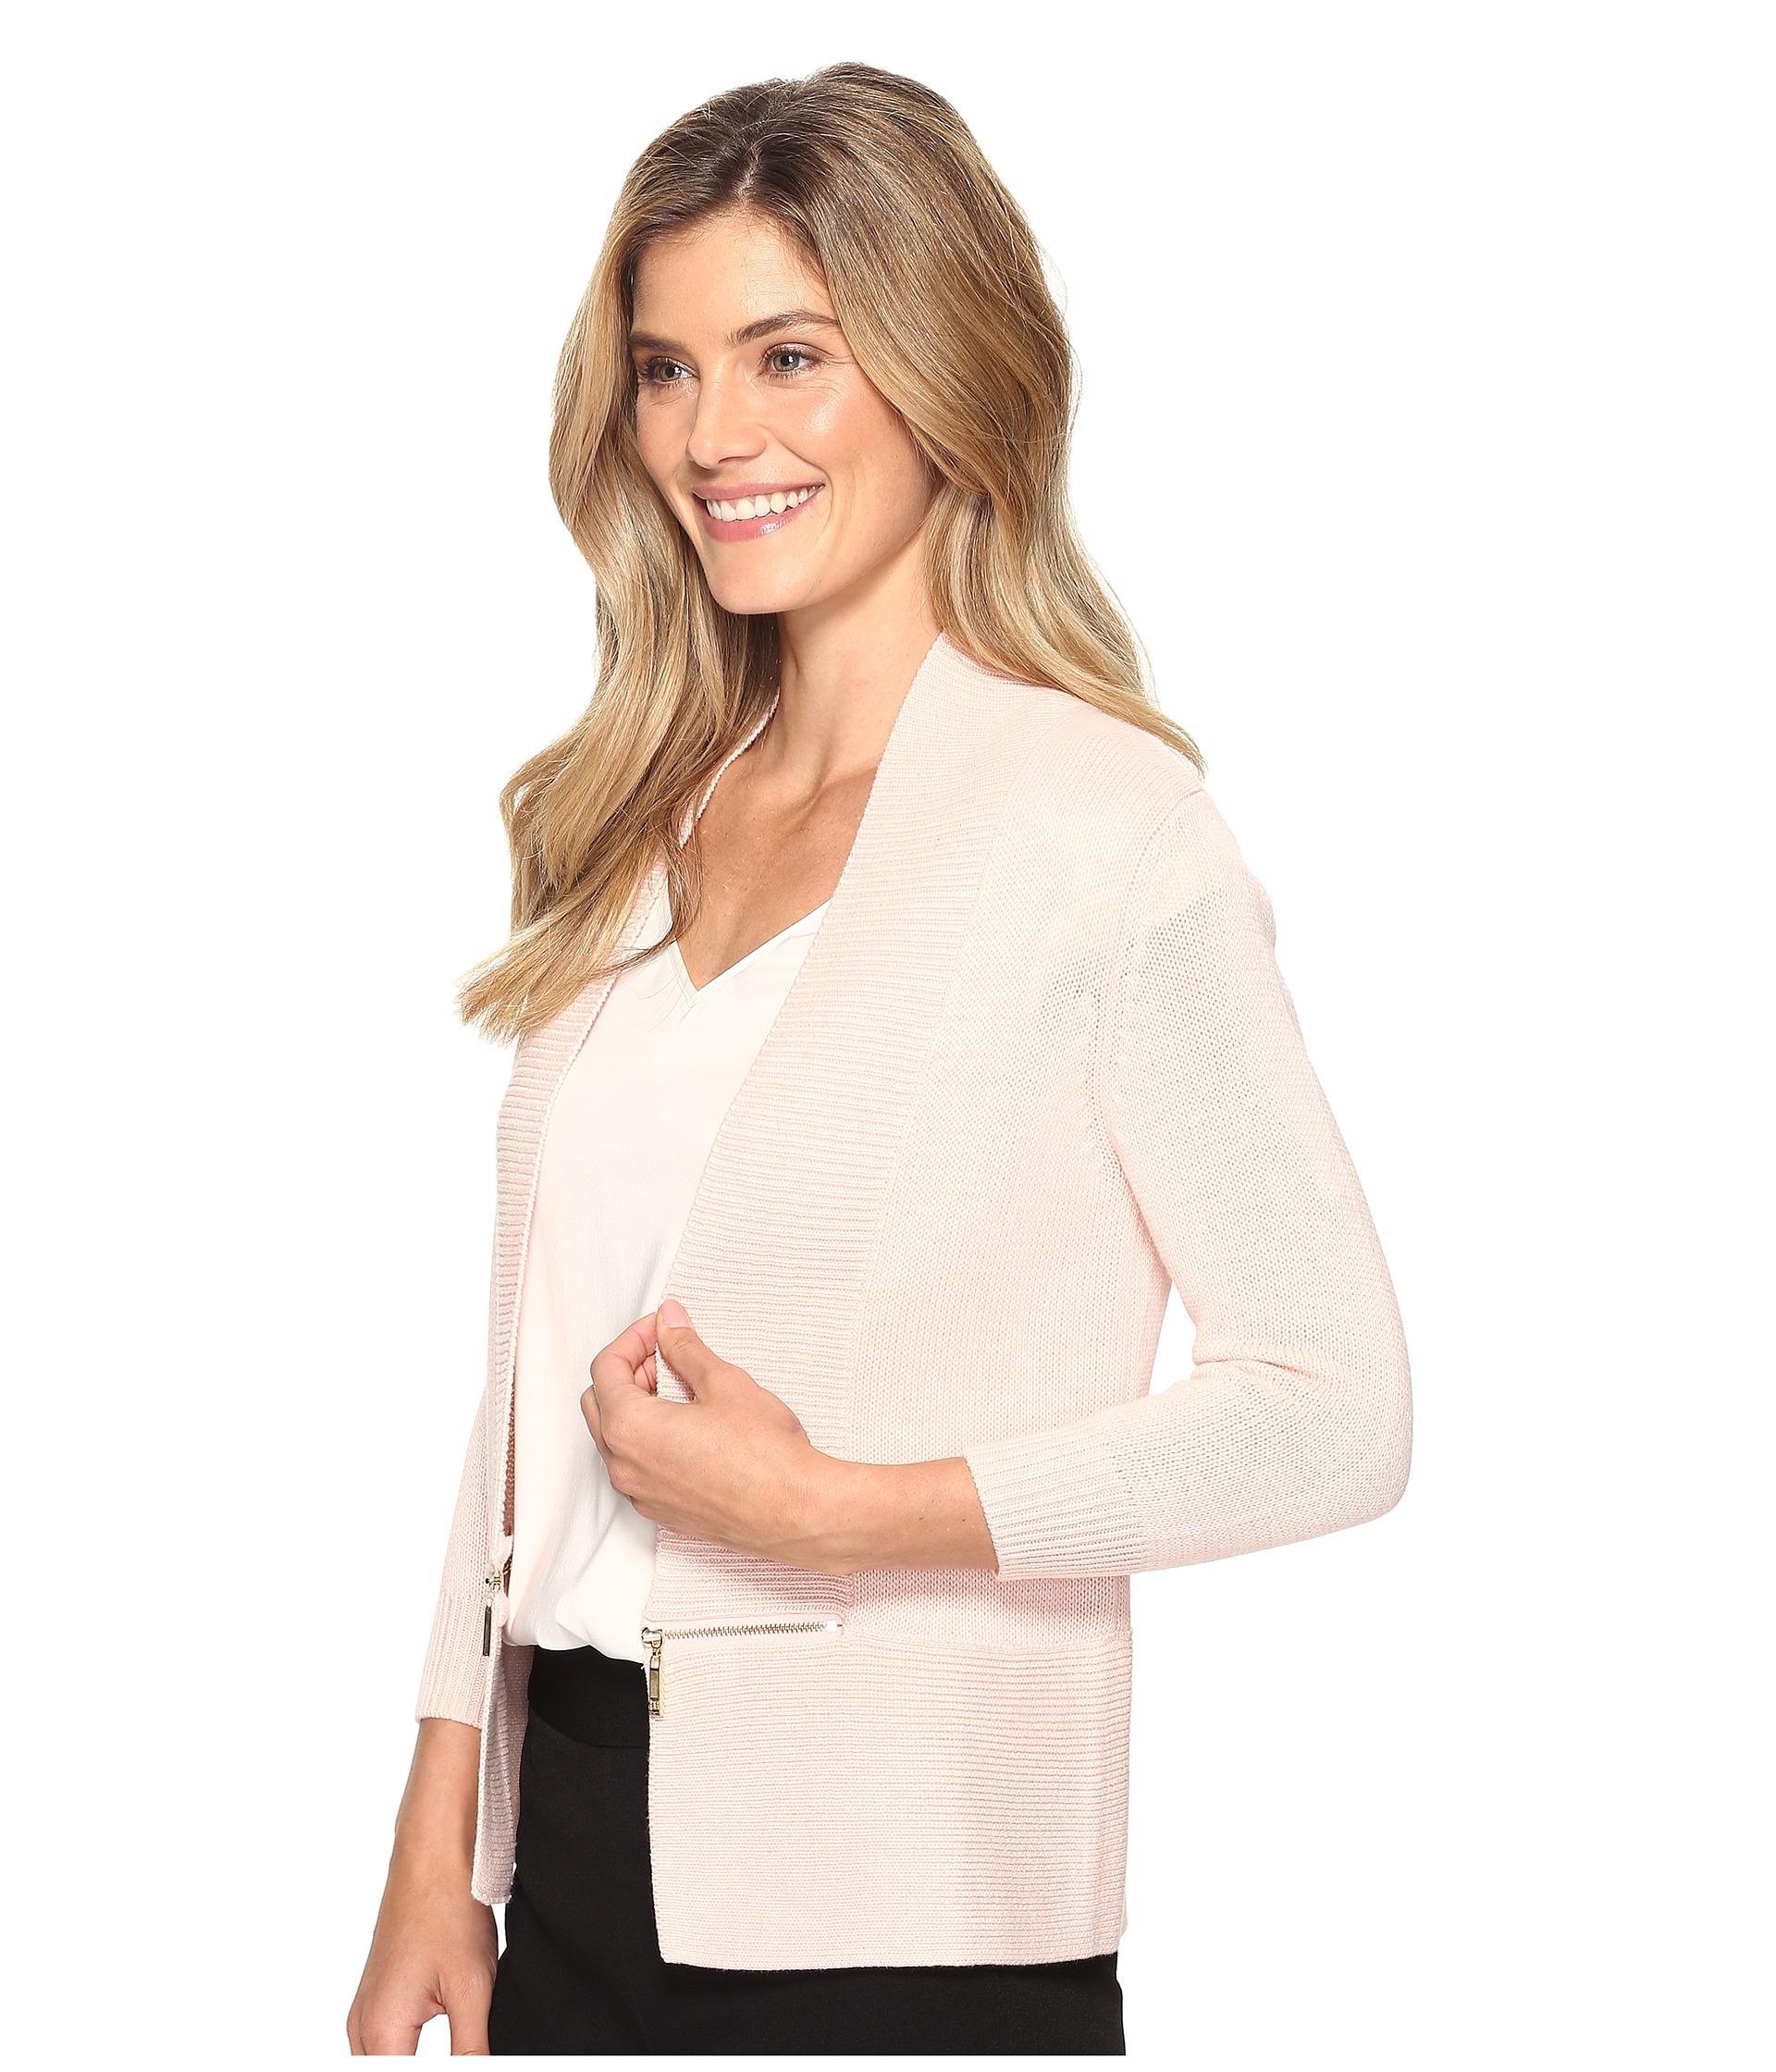 Ivanka Trump Open Fly-A-Way Zipper Cardigan Sweater - Zappos.com Free ...